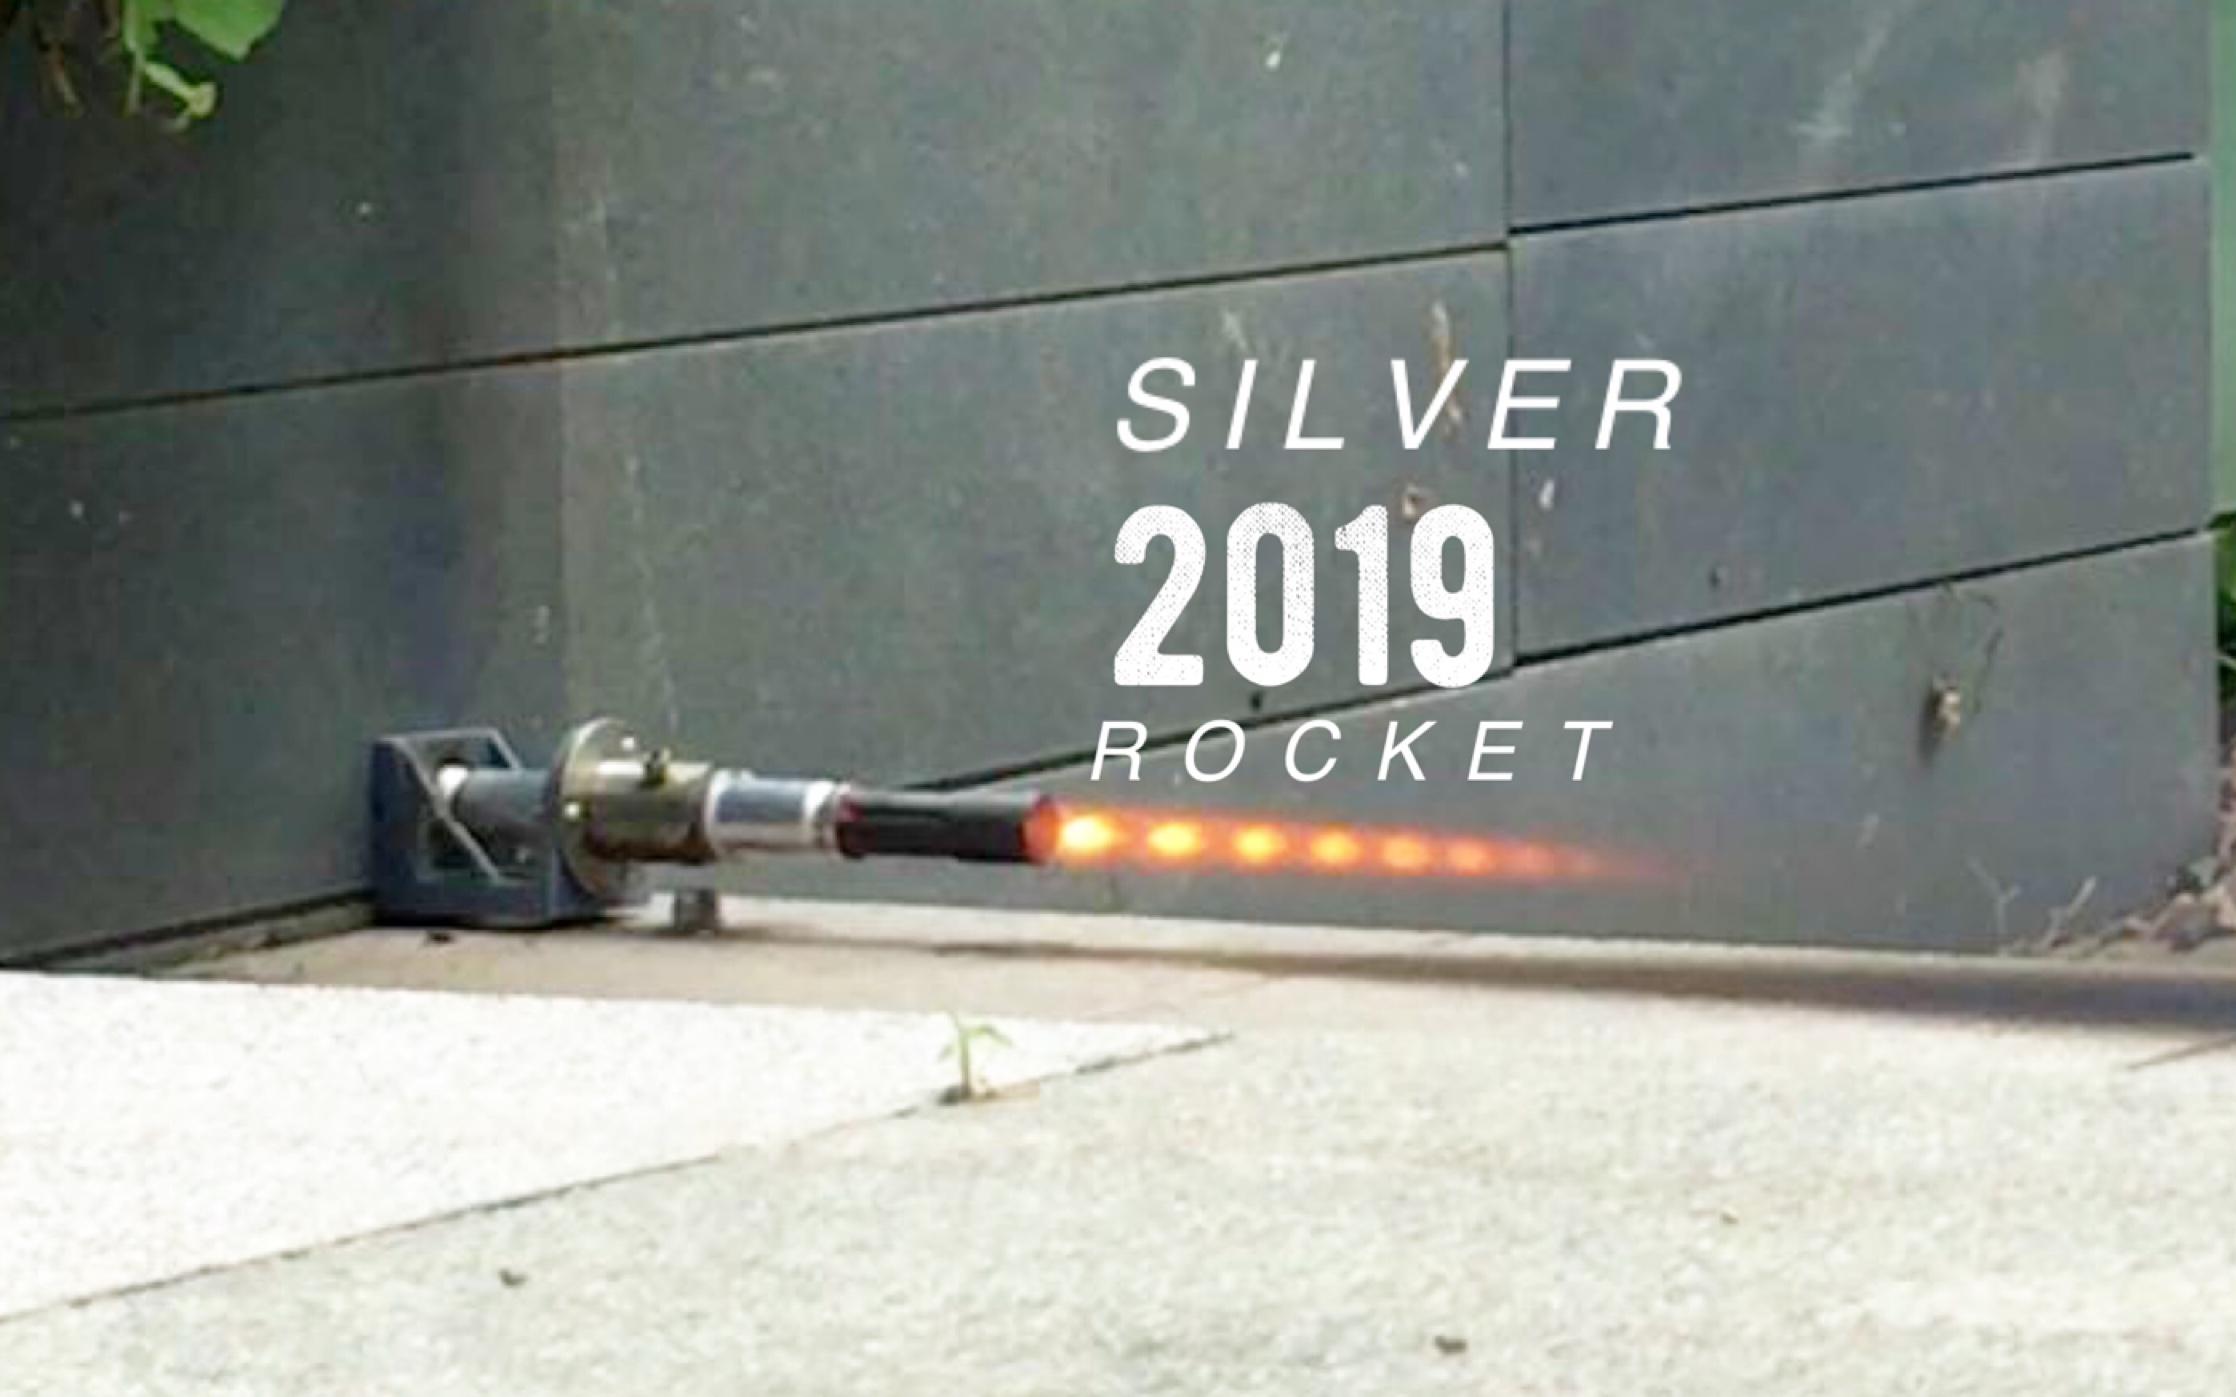 趣味科学实验视频_固体火箭发动机改二全功率实验_哔哩哔哩 (゜-゜)つロ 干杯~-bilibili